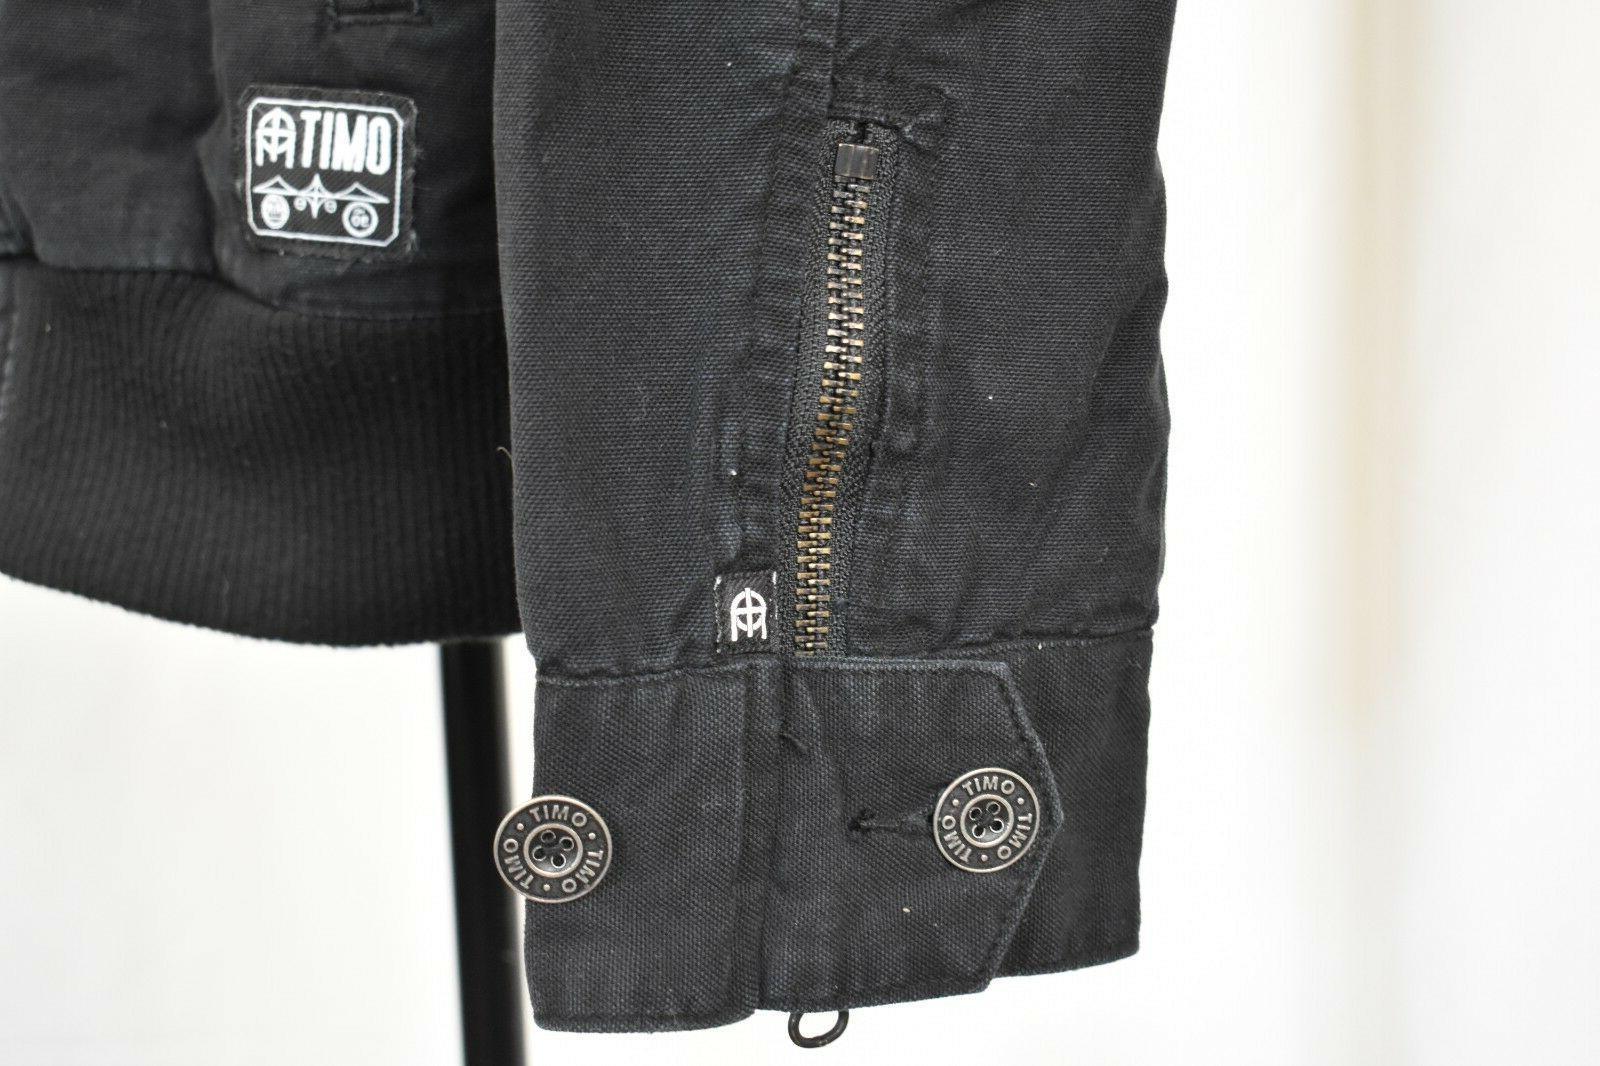 OMIT Apparel Brand Full-Zip Black Jacket